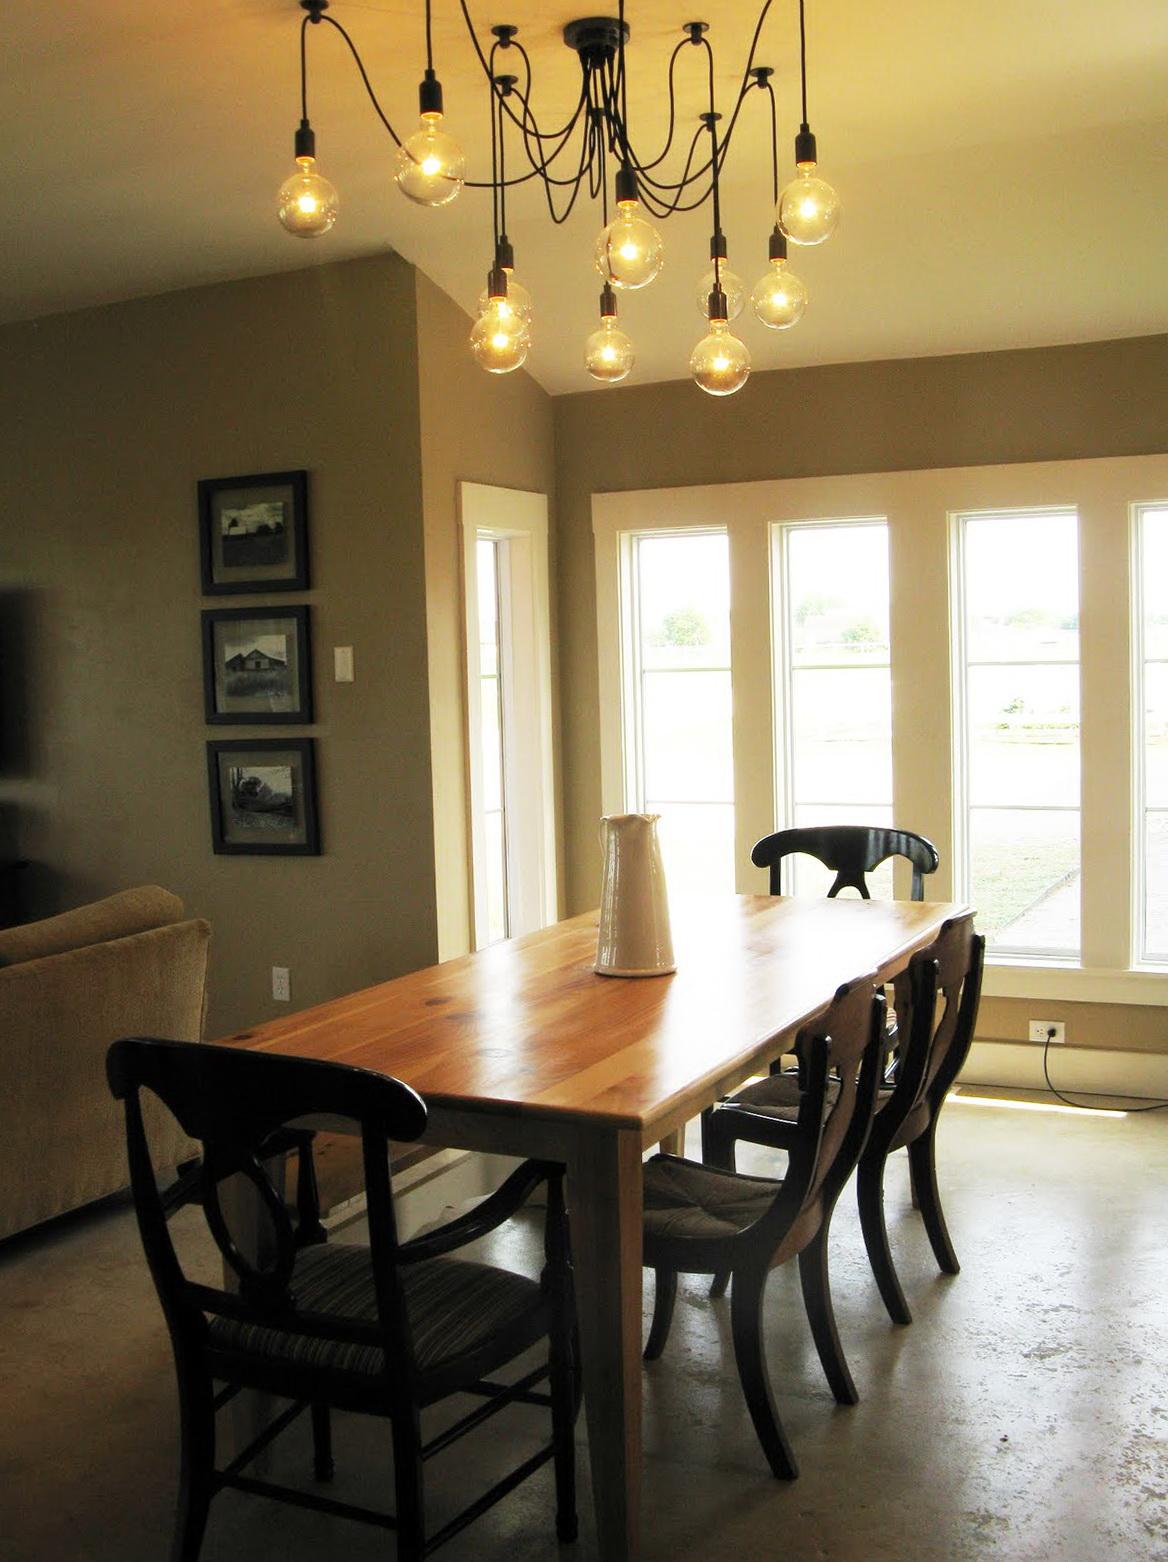 Edison Bulb Chandelier Dining Room Home Design Ideas : edison bulb chandelier dining room from www.theenergylibrary.com size 1168 x 1562 jpeg 464kB